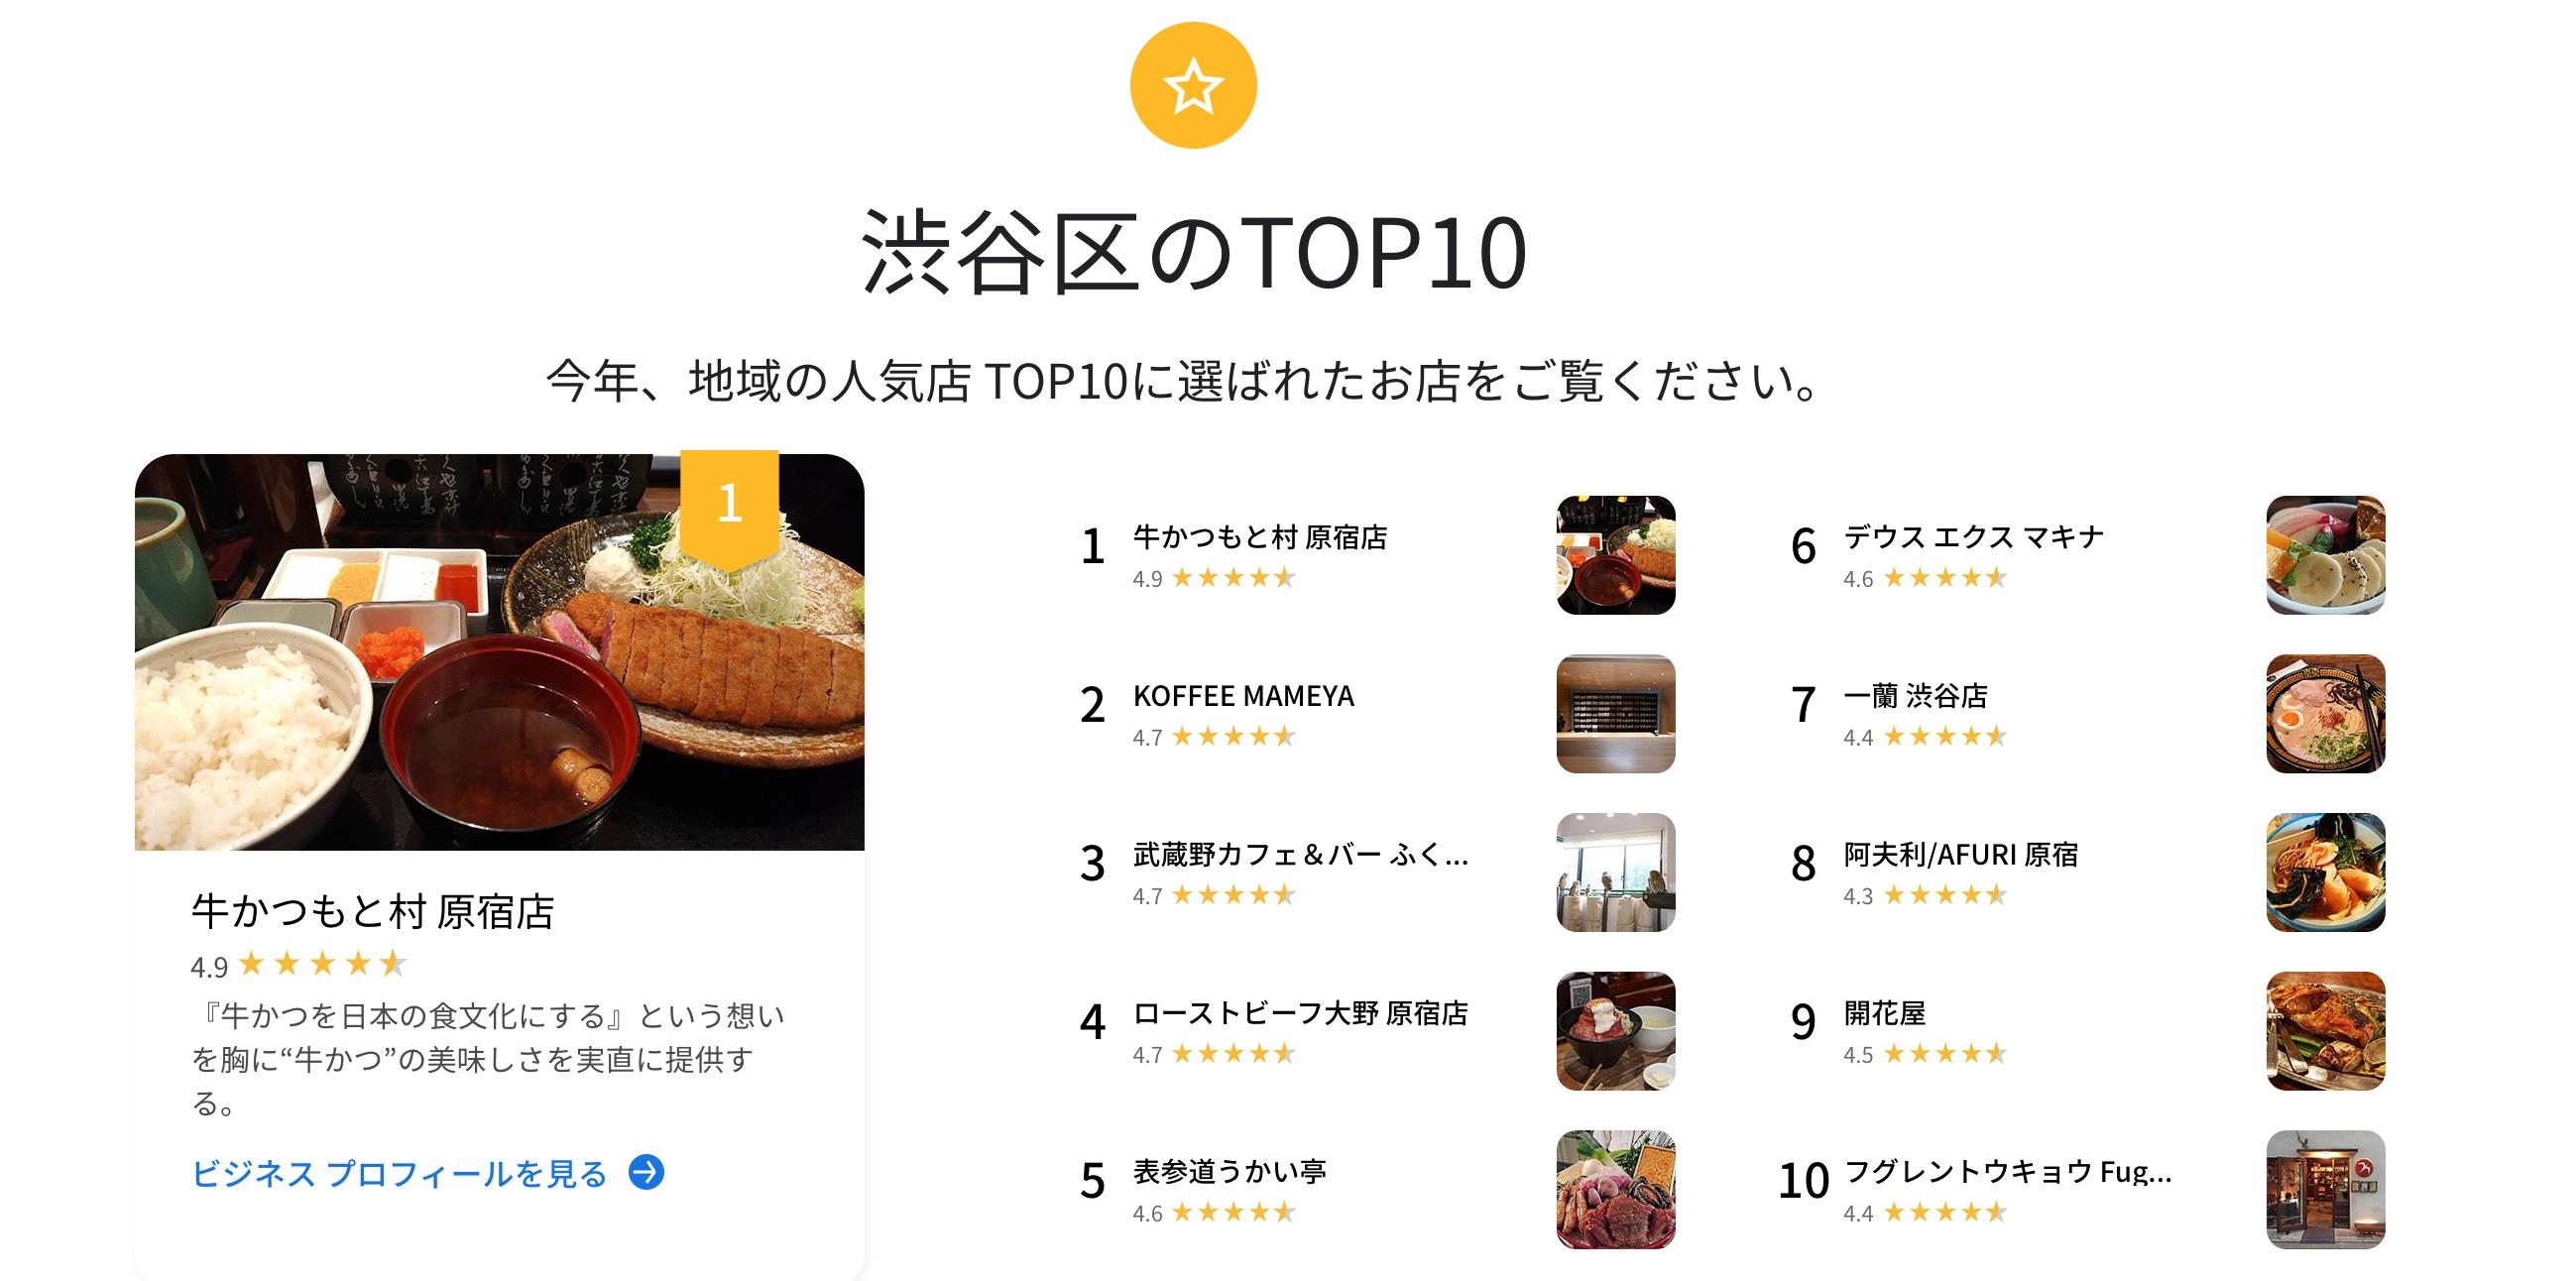 Local Favorites機能で渋谷区人気店TOP10